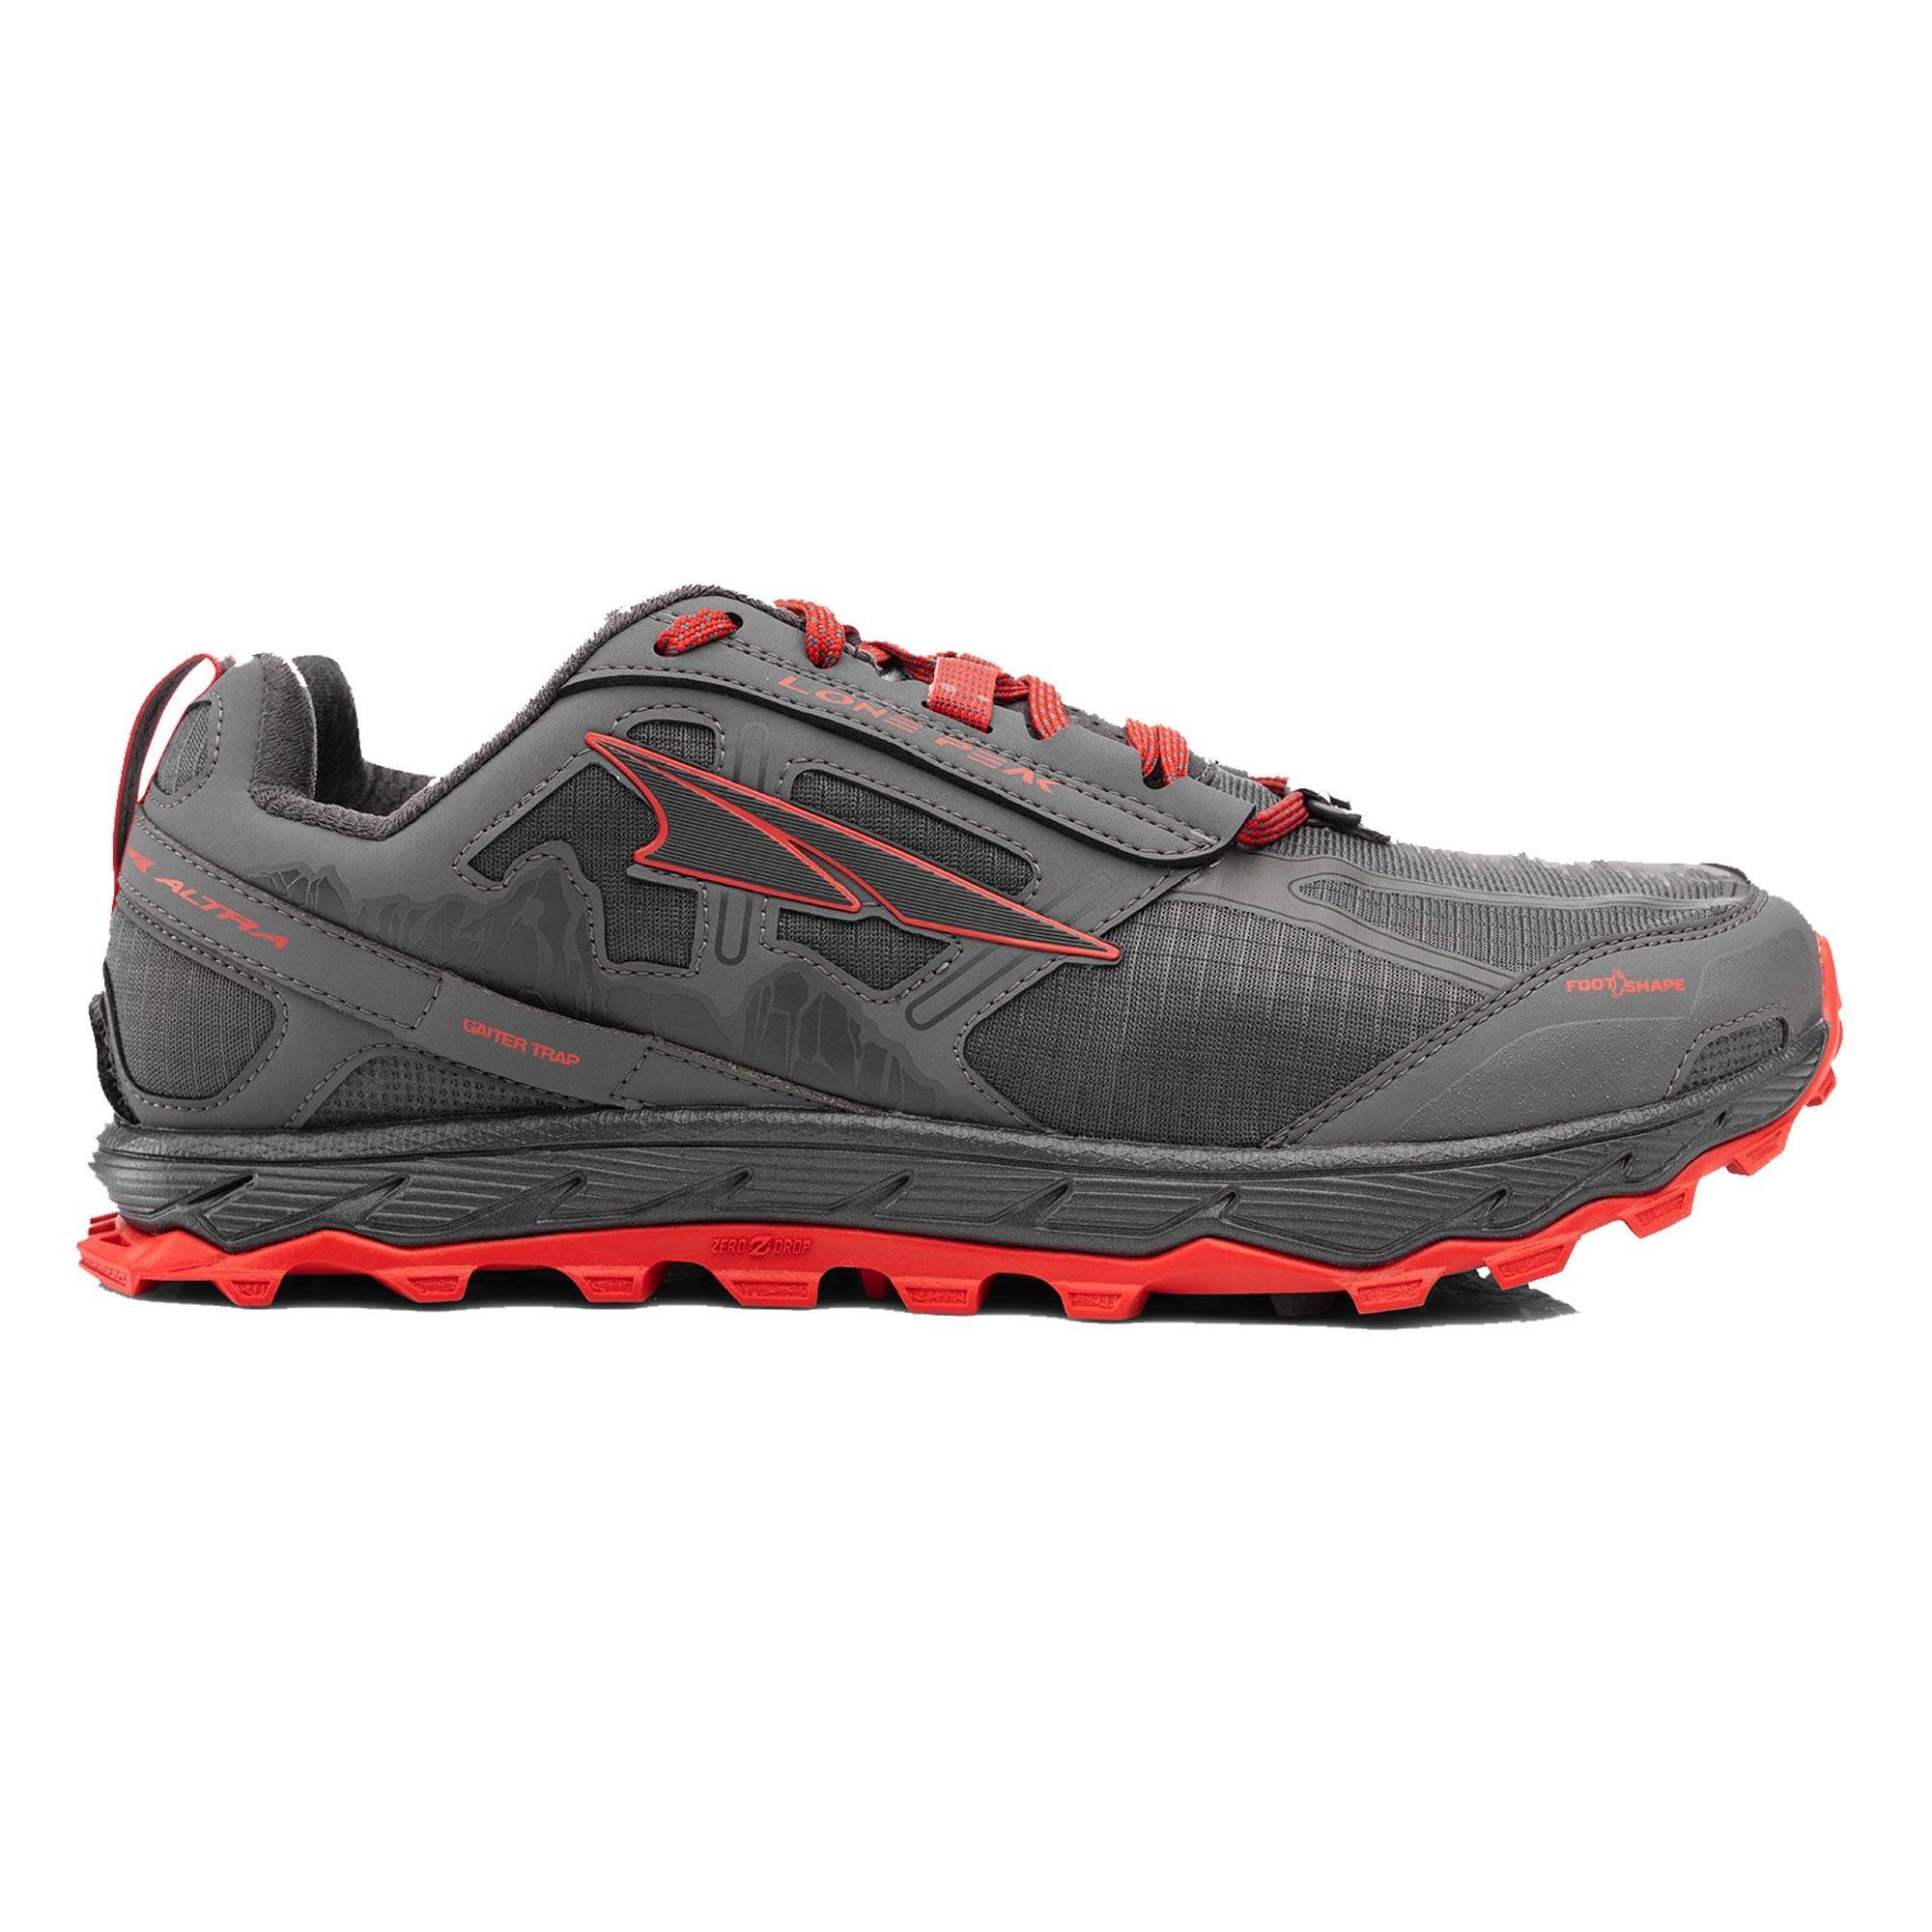 Altra Lone Peak 4 Mesh Mens Zero Drop Trail Running Shoes Ebay